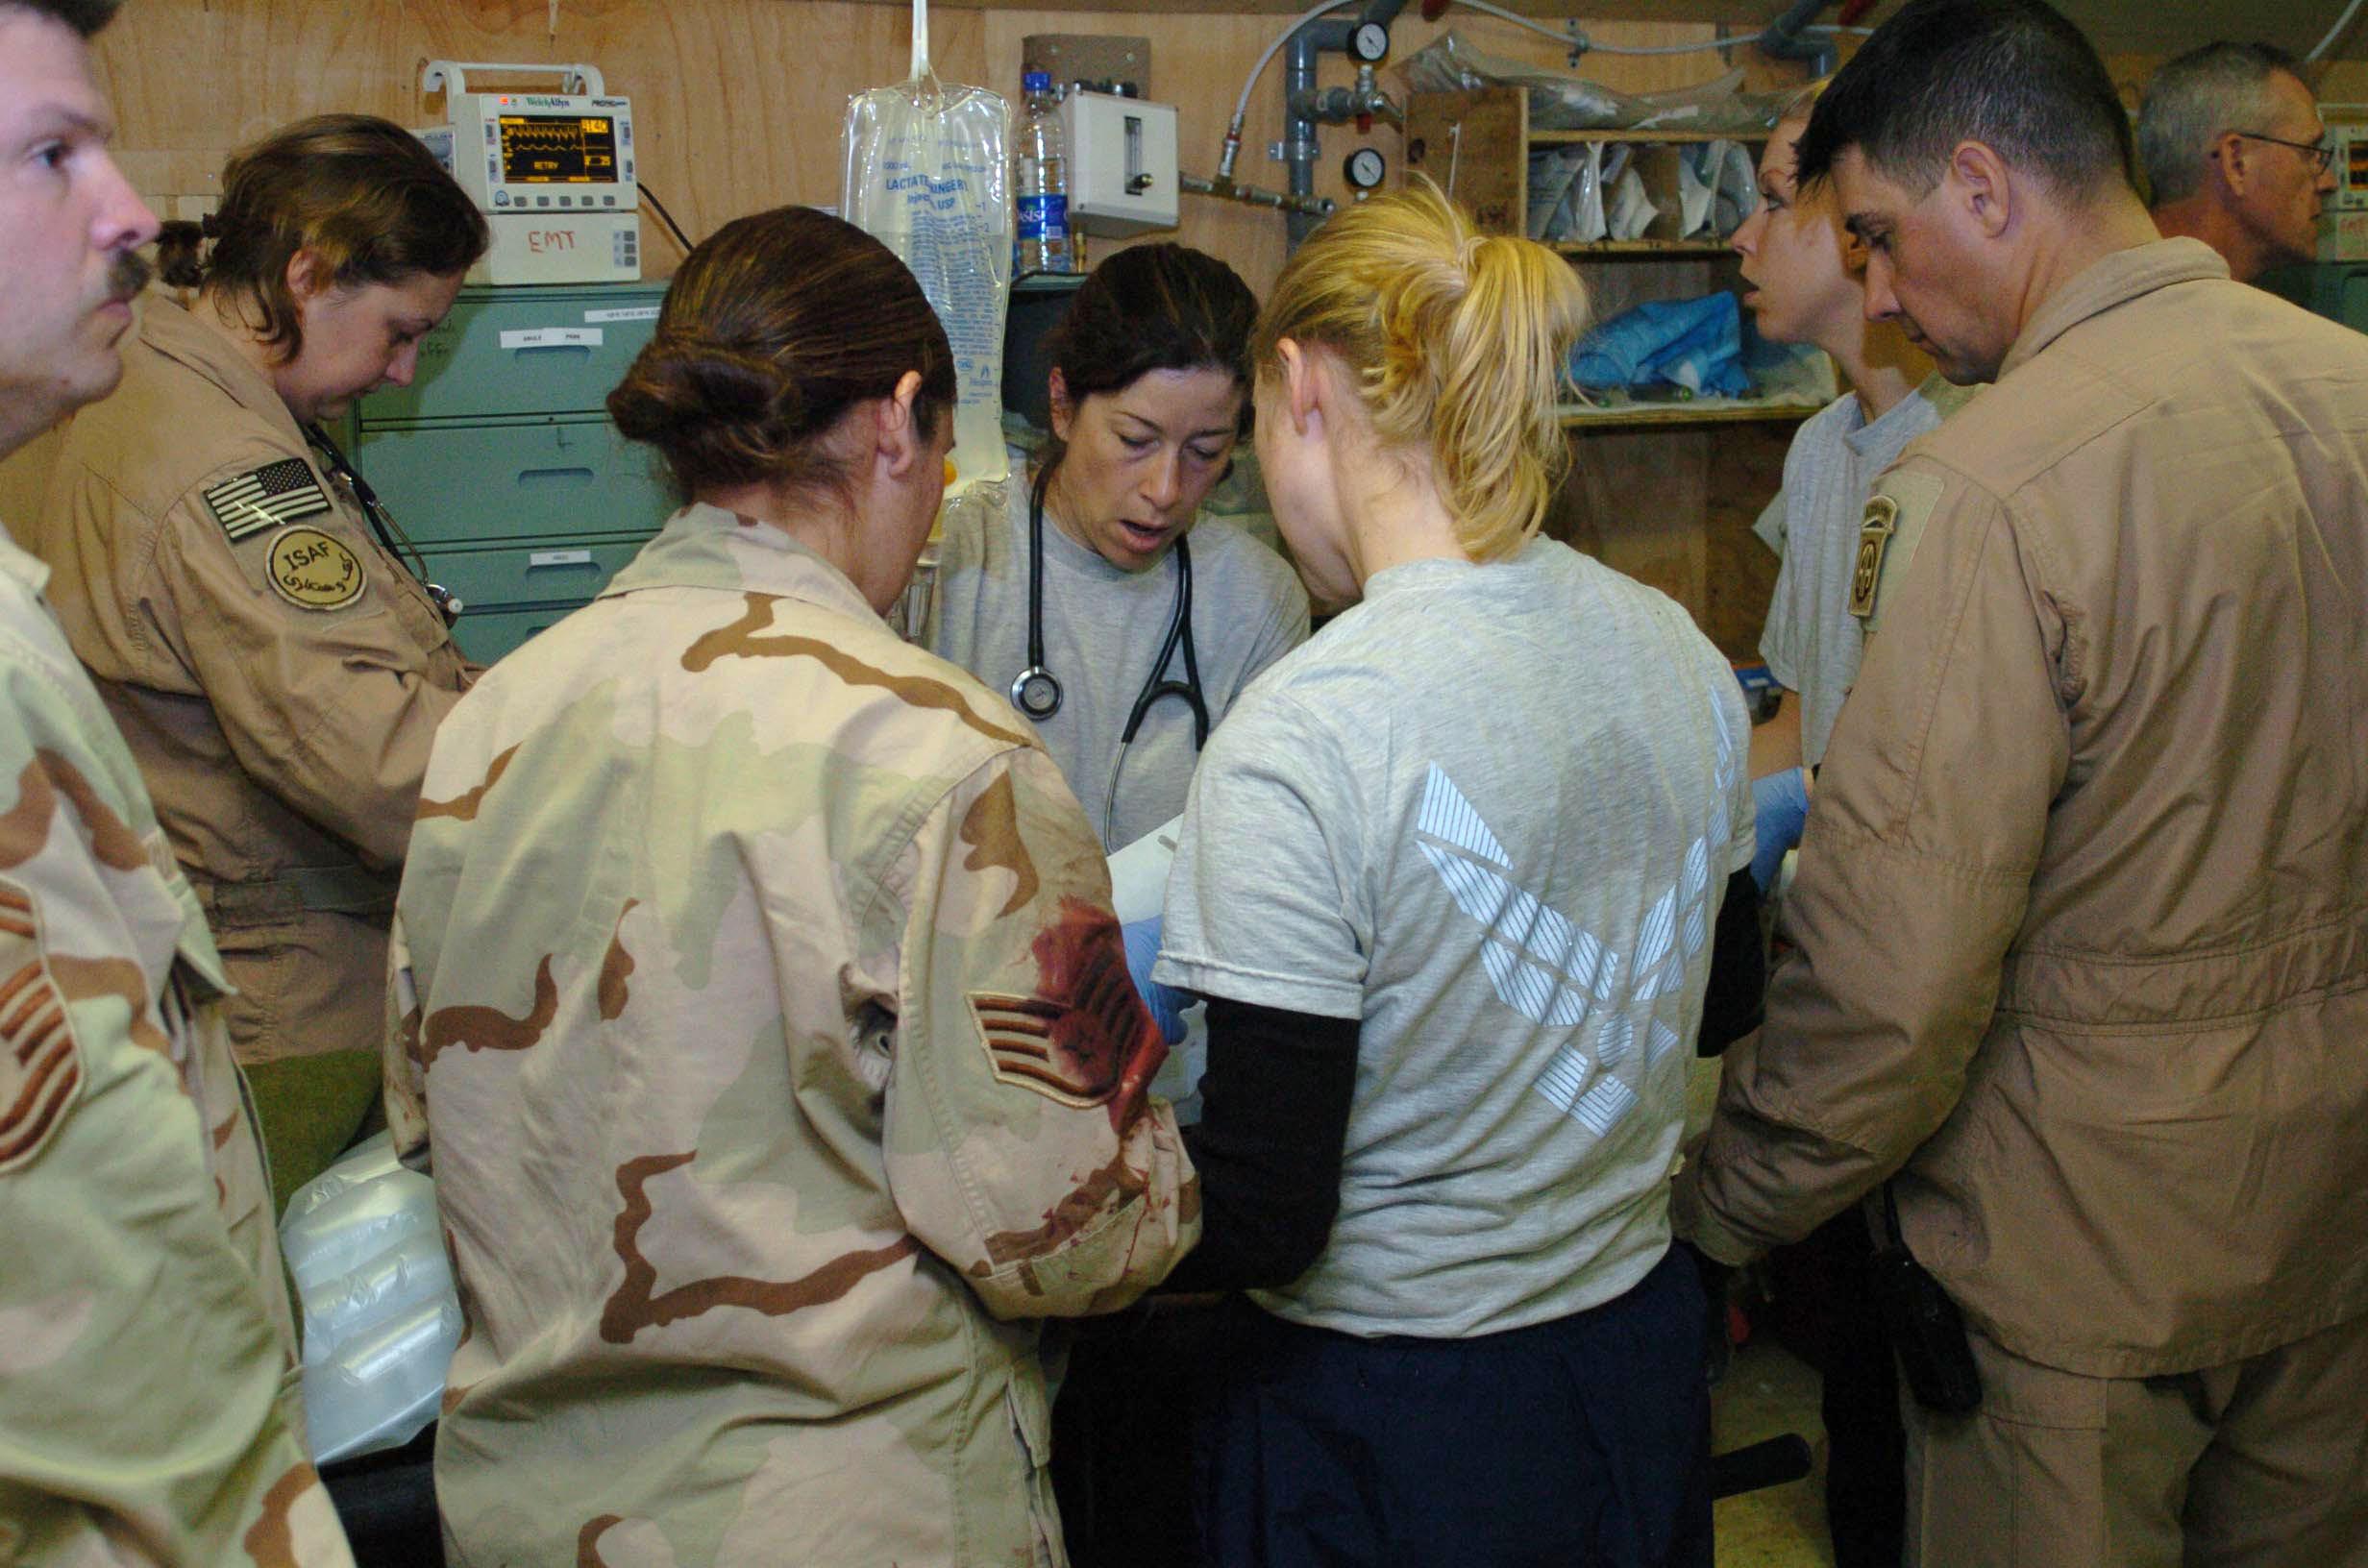 Cheney OK after blast at Afghan base - World news -